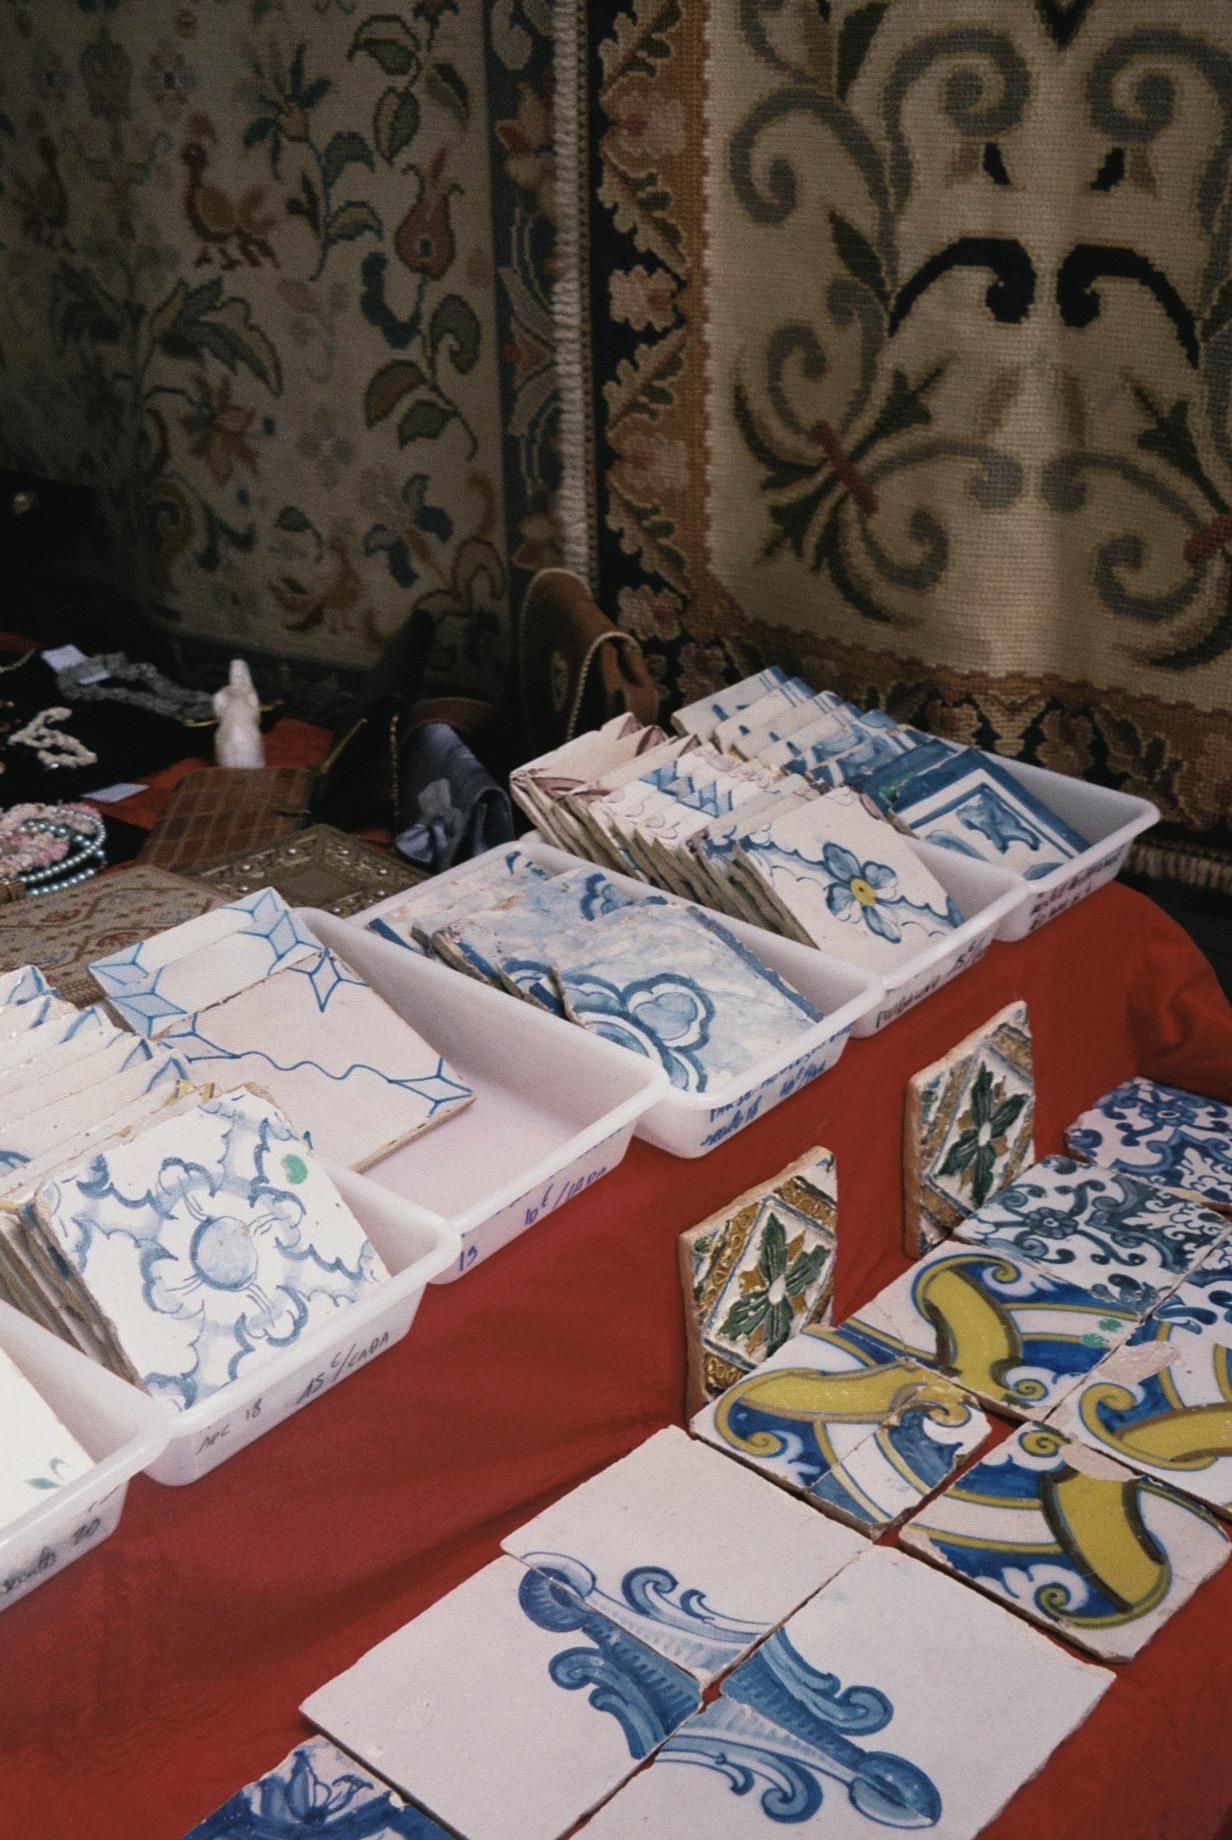 Old Portuguese tiles for sale at feira da ladra.  / Azulejos antigos portugueses para venda na feira da ladra.